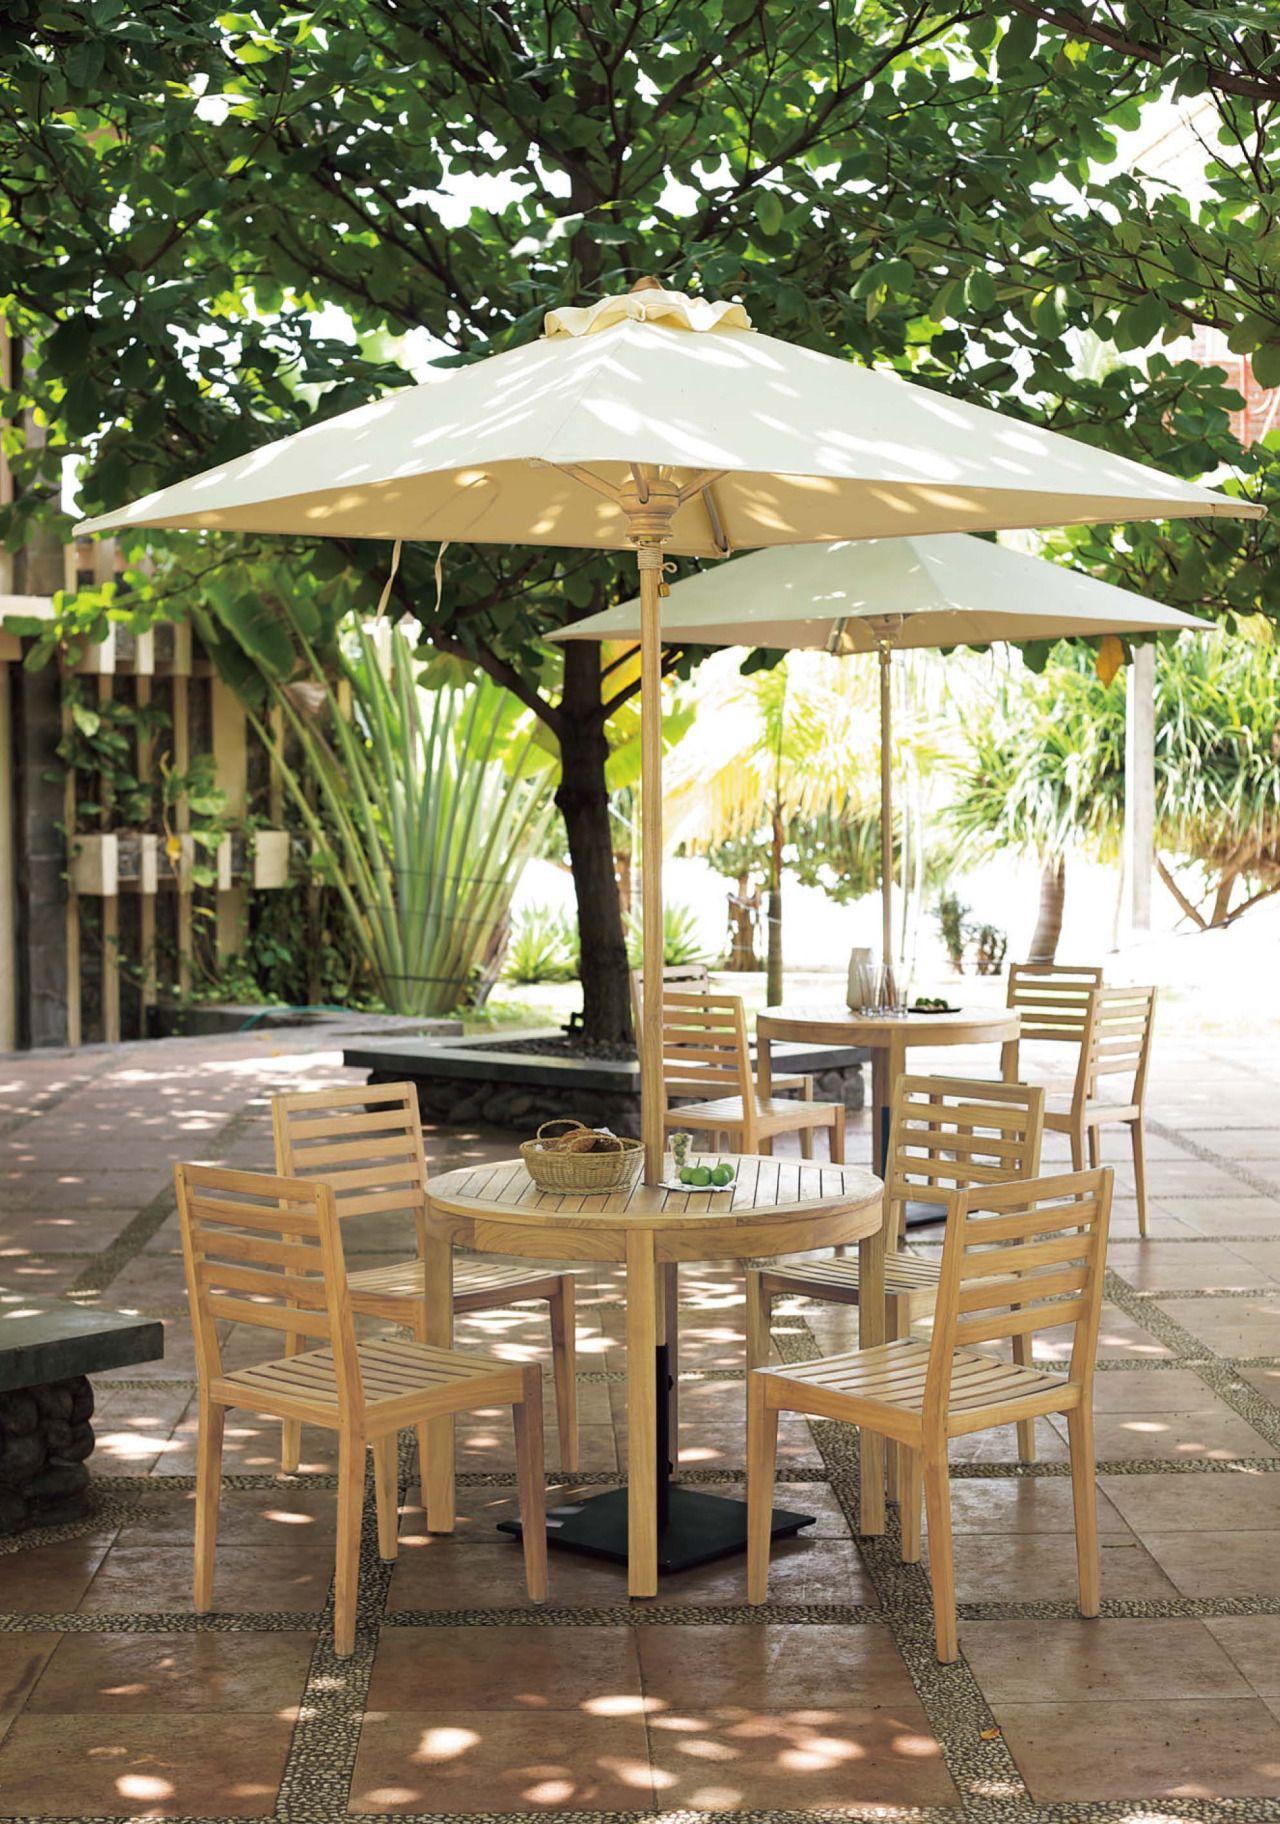 Flymee #resort #garden #terrace #furniture #chair #parasol